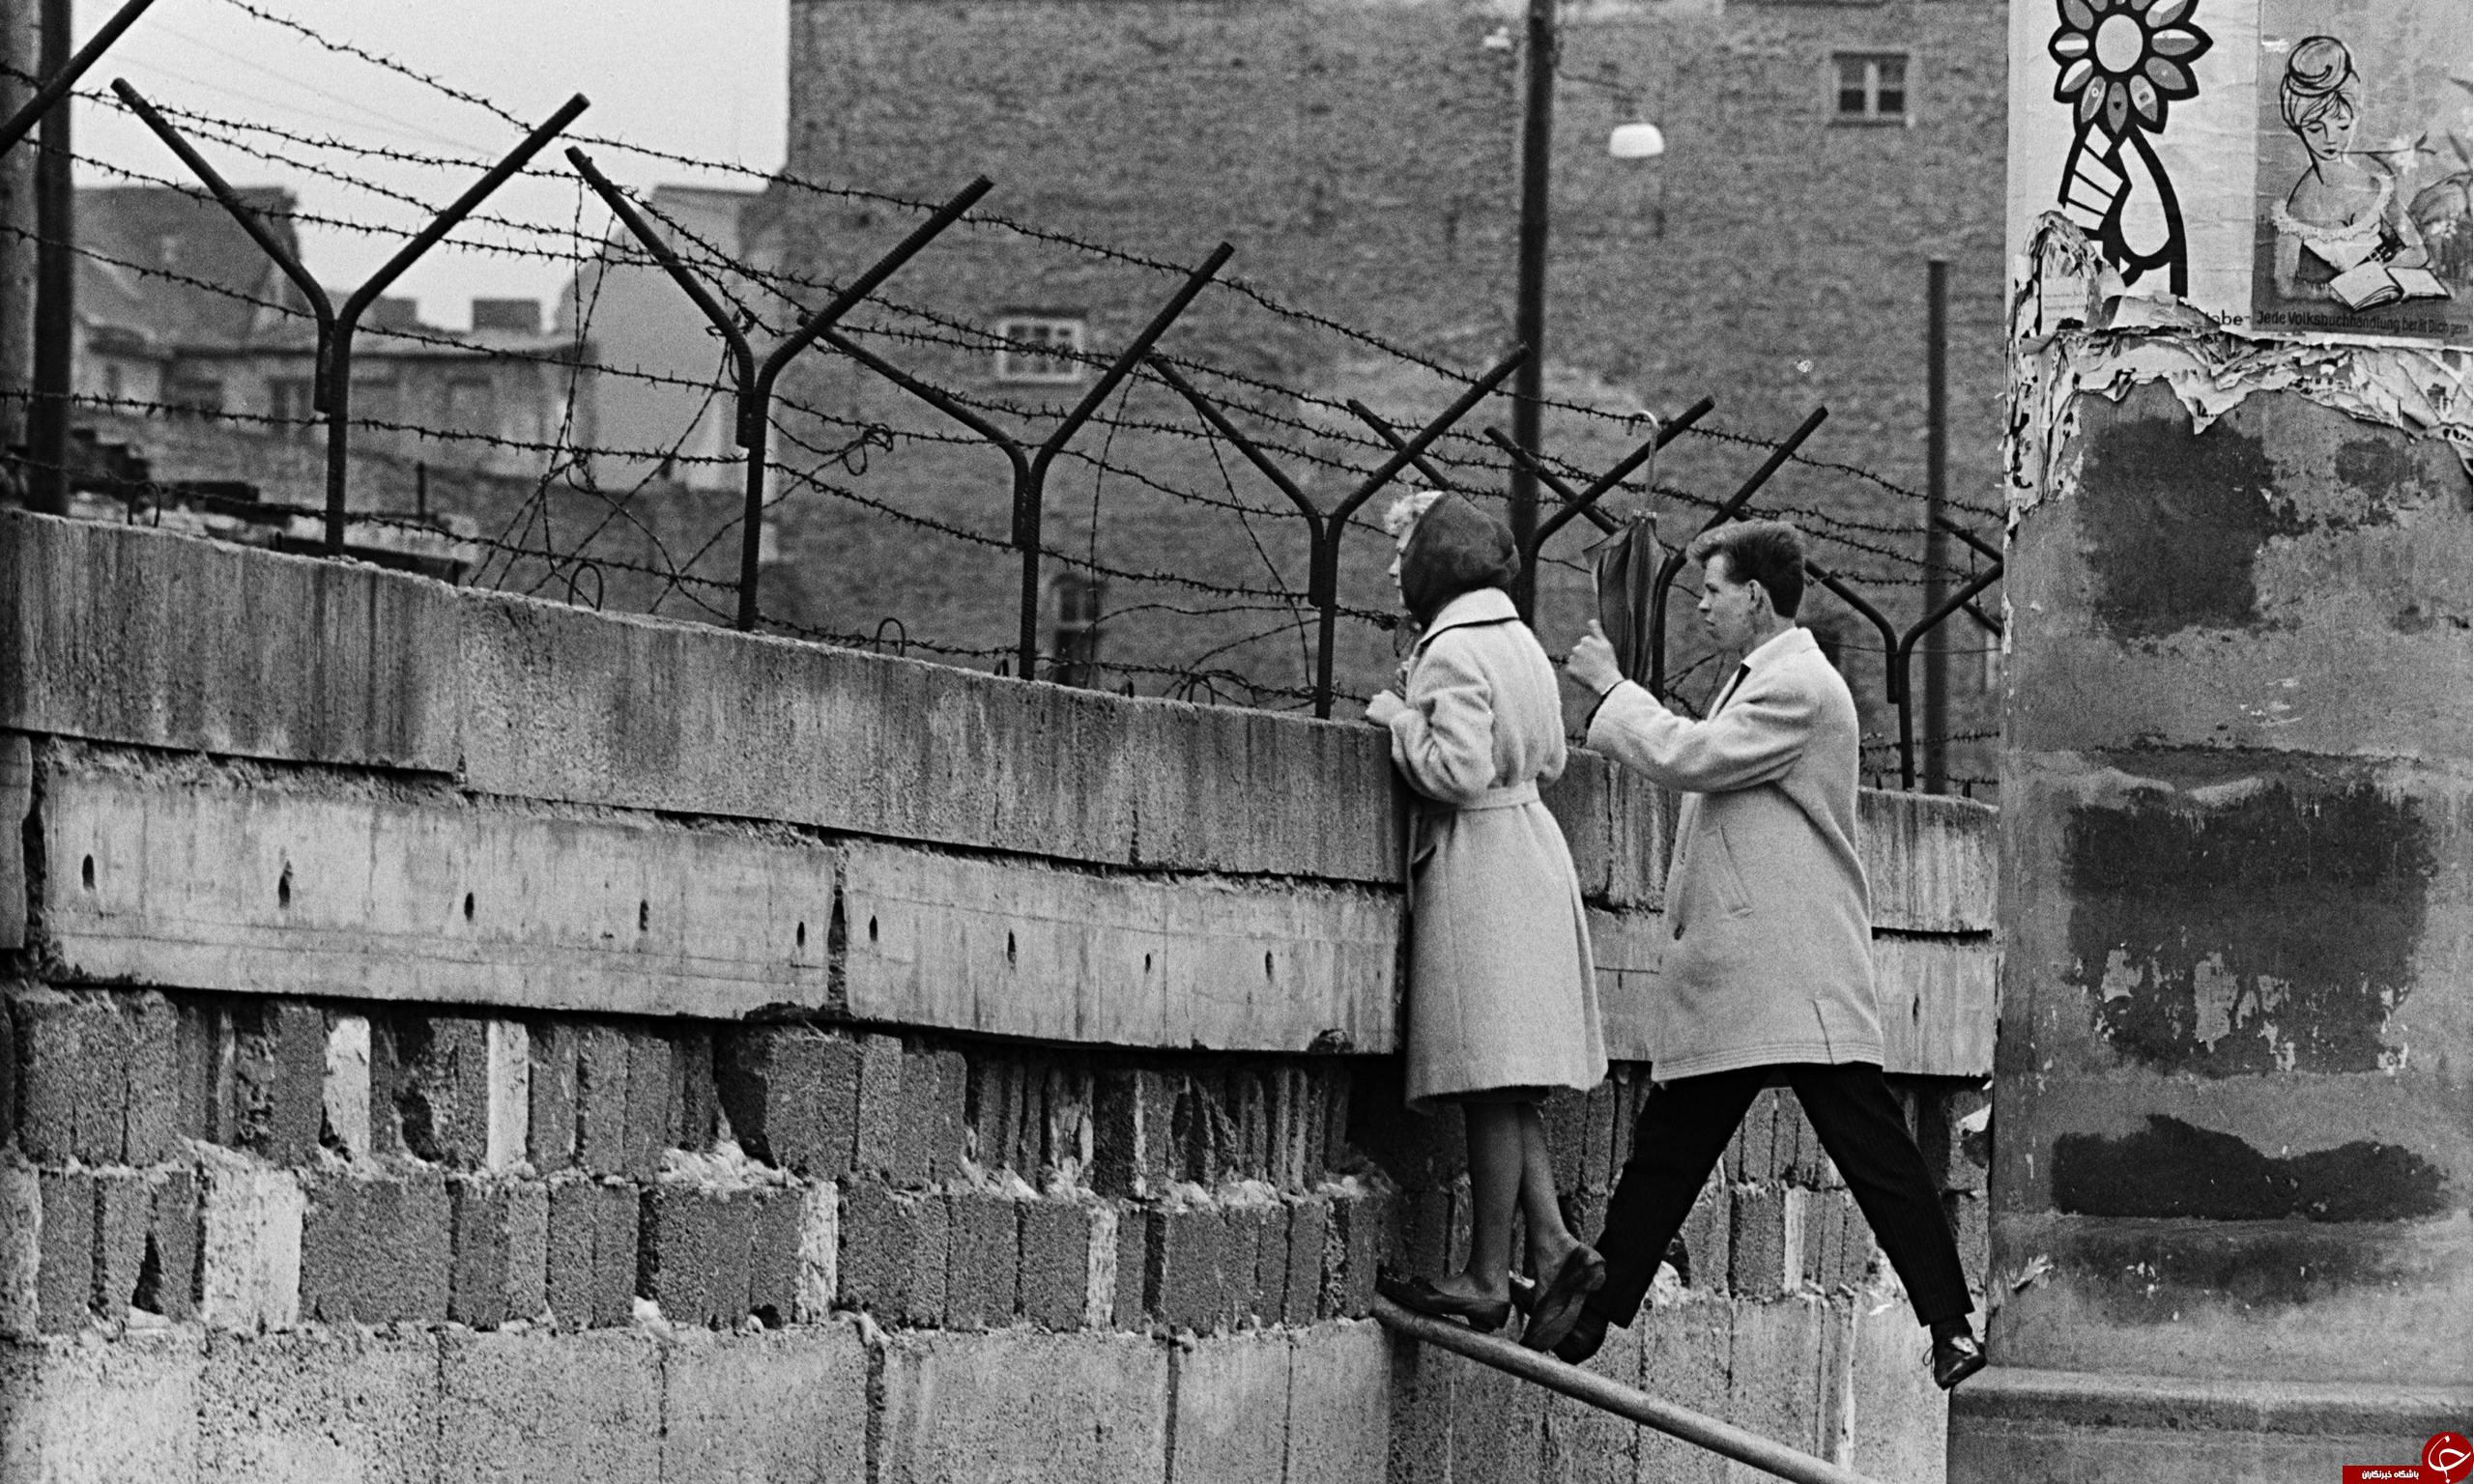 تصویری غم انگیز از دیوار برلین!